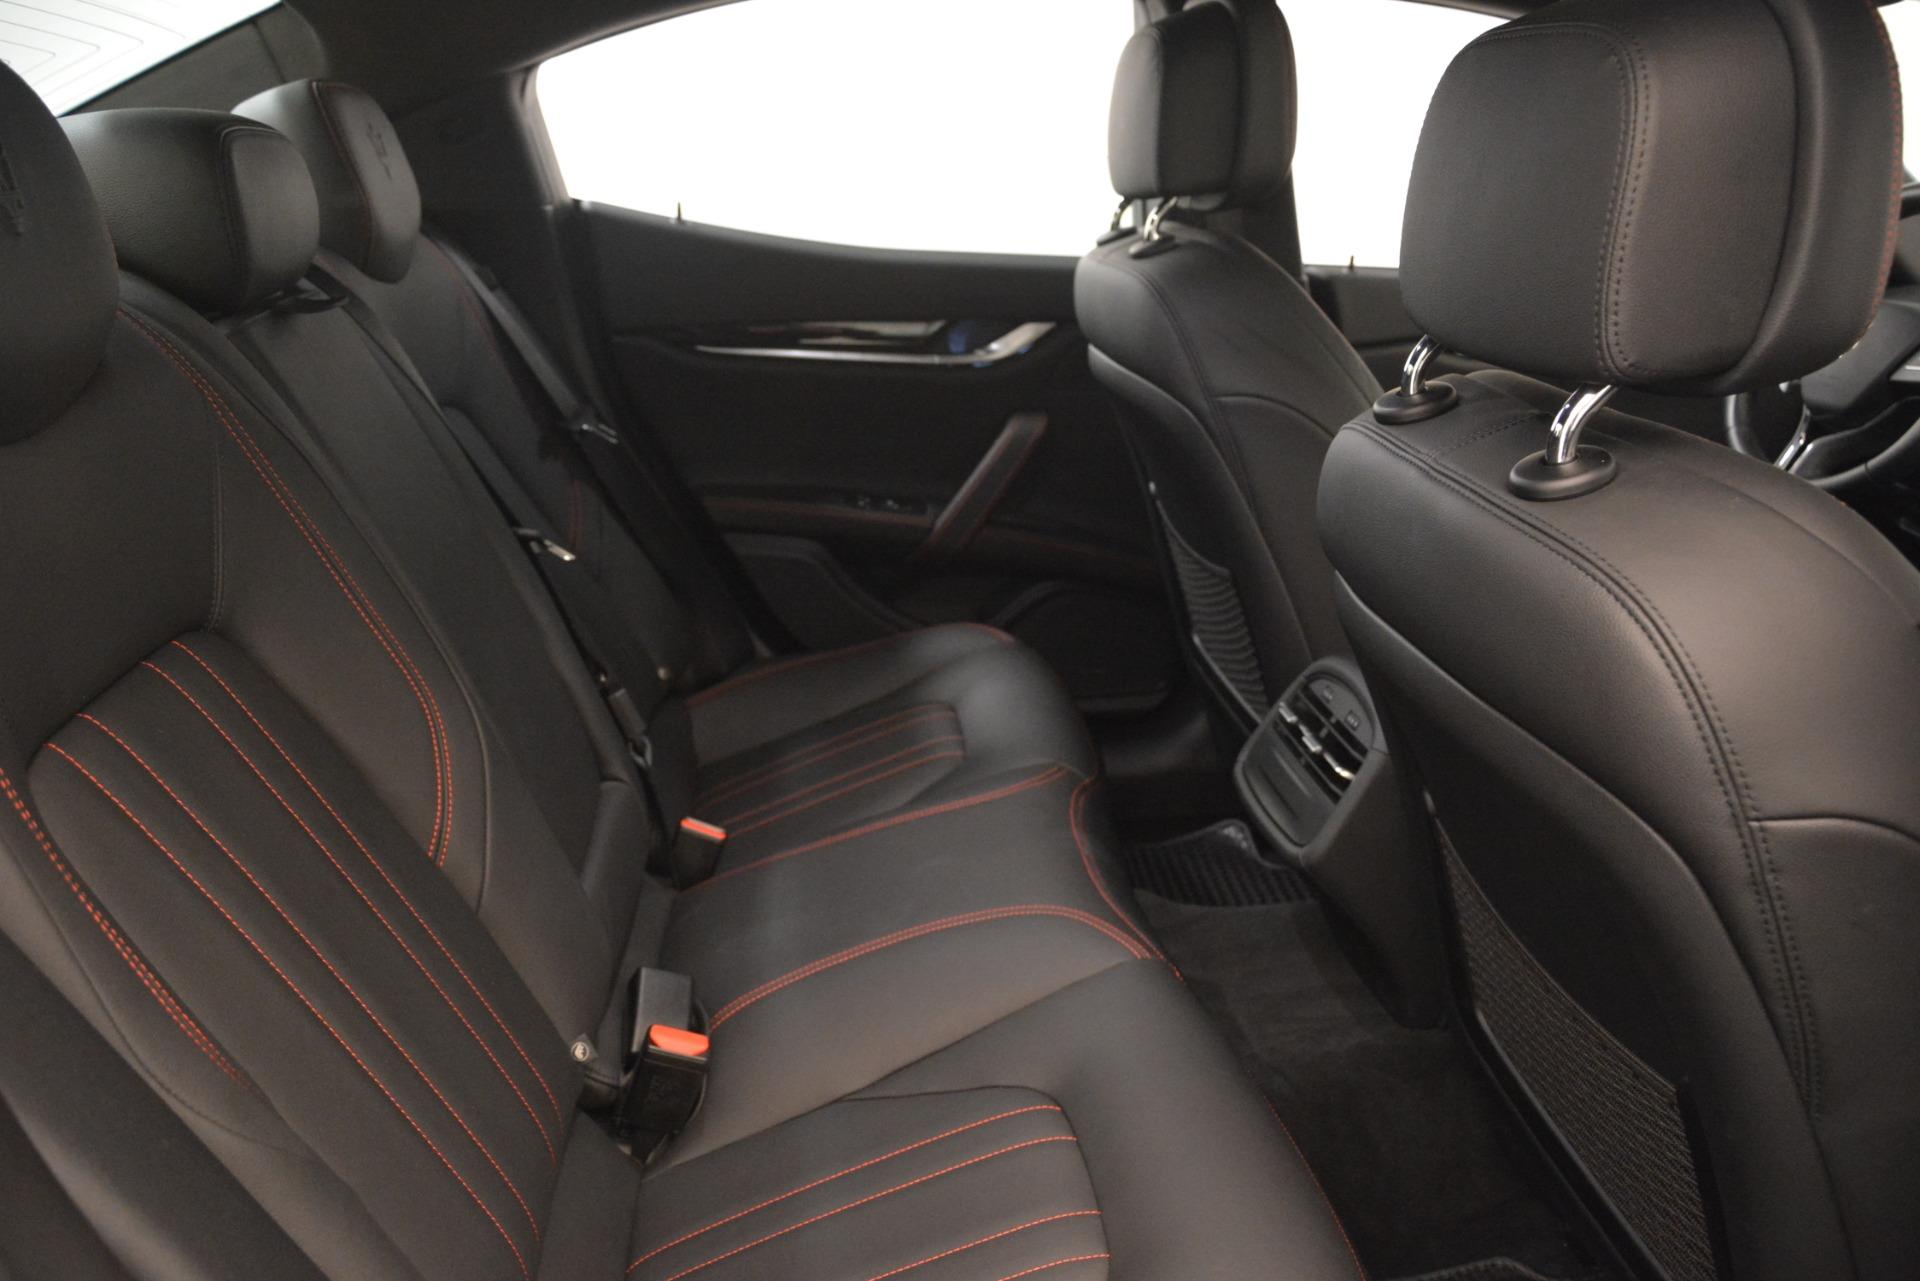 Used 2018 Maserati Ghibli S Q4 For Sale In Greenwich, CT 1772_p23